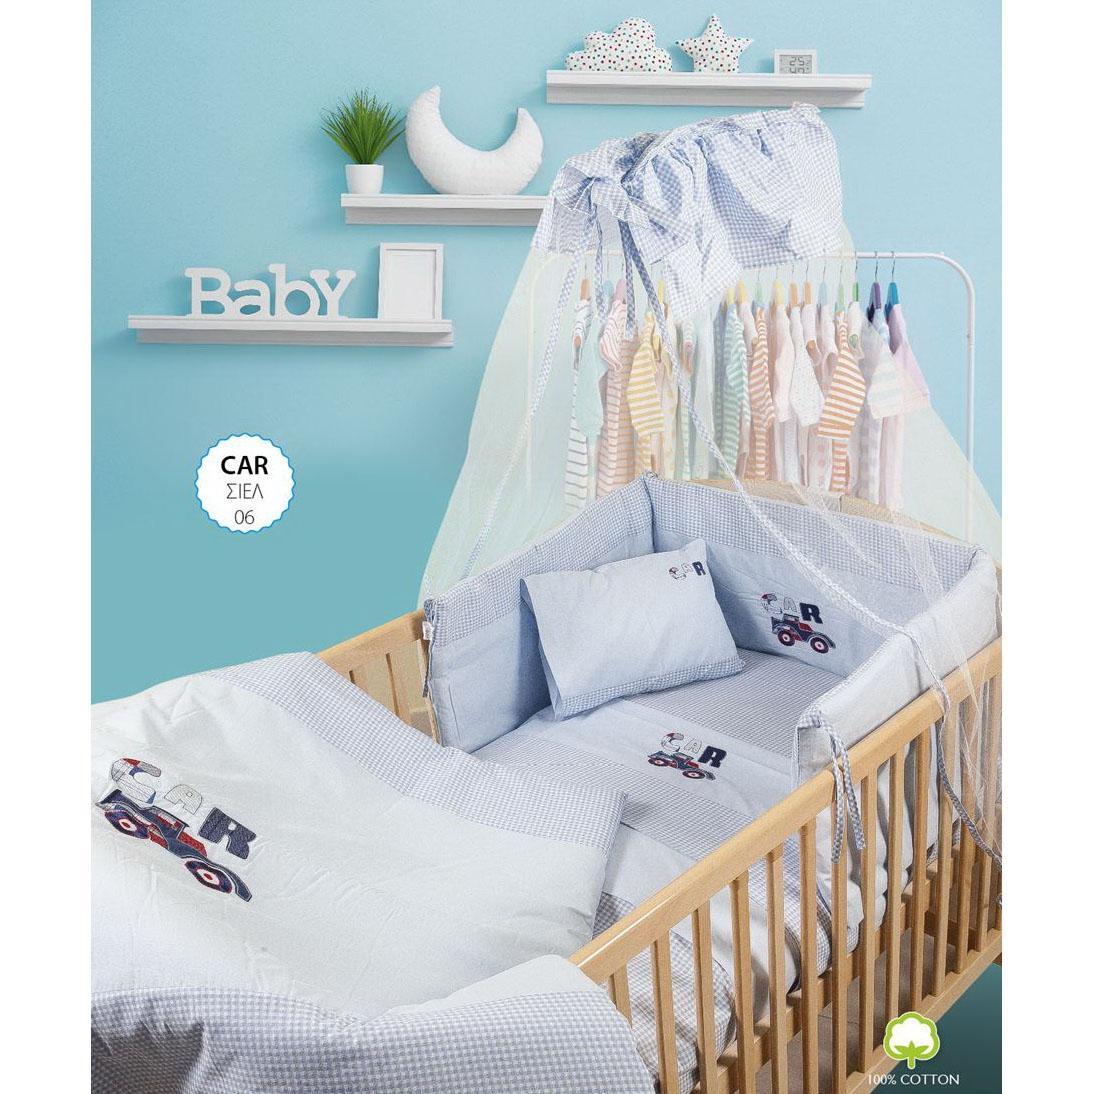 8ea540a0ff4 Προίκα Μωρού (Dim-Car) | Lux House | Λευκά Είδη | Διακοσμητικά ...